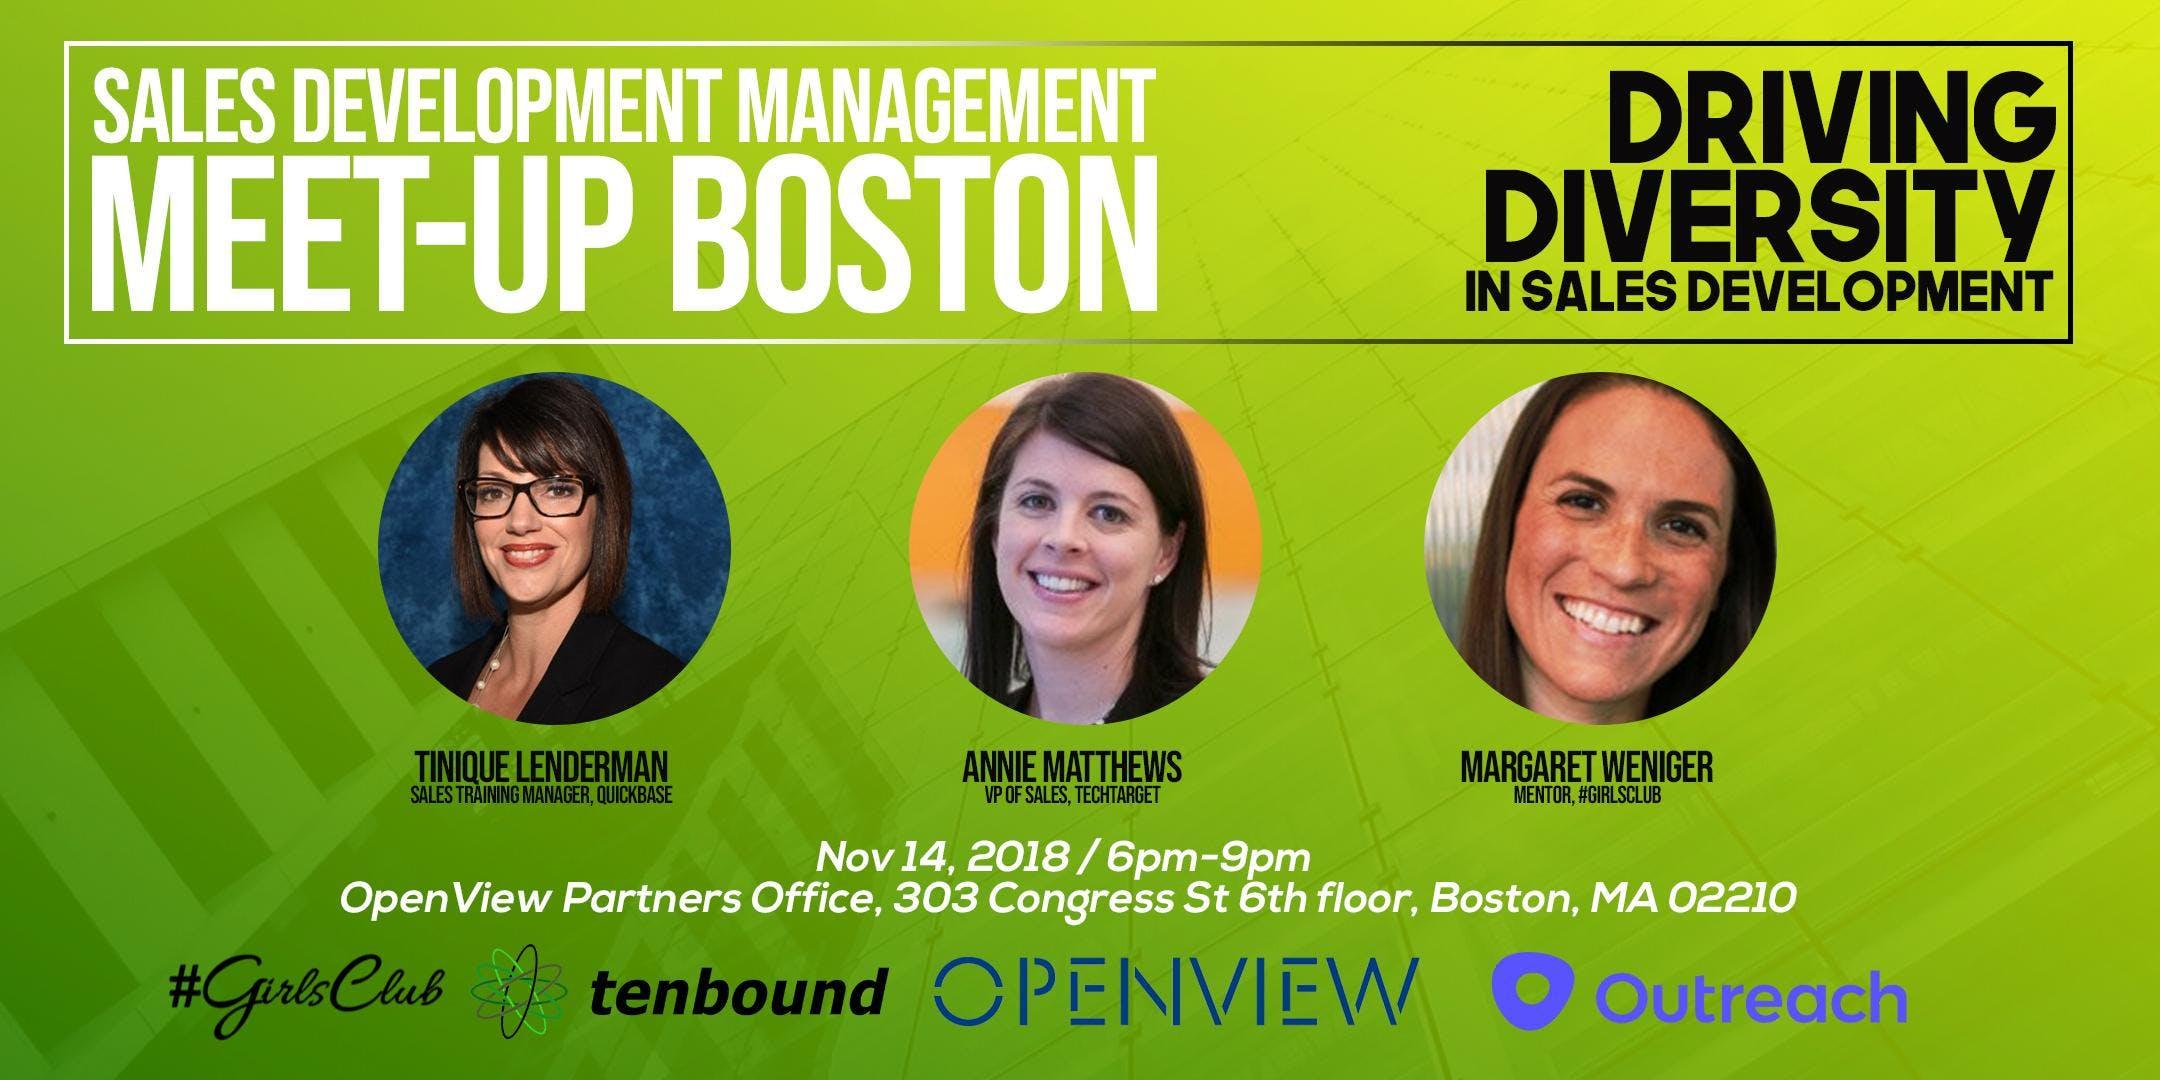 Sales Development Management Meetup  Driving Diversity in Sales Development